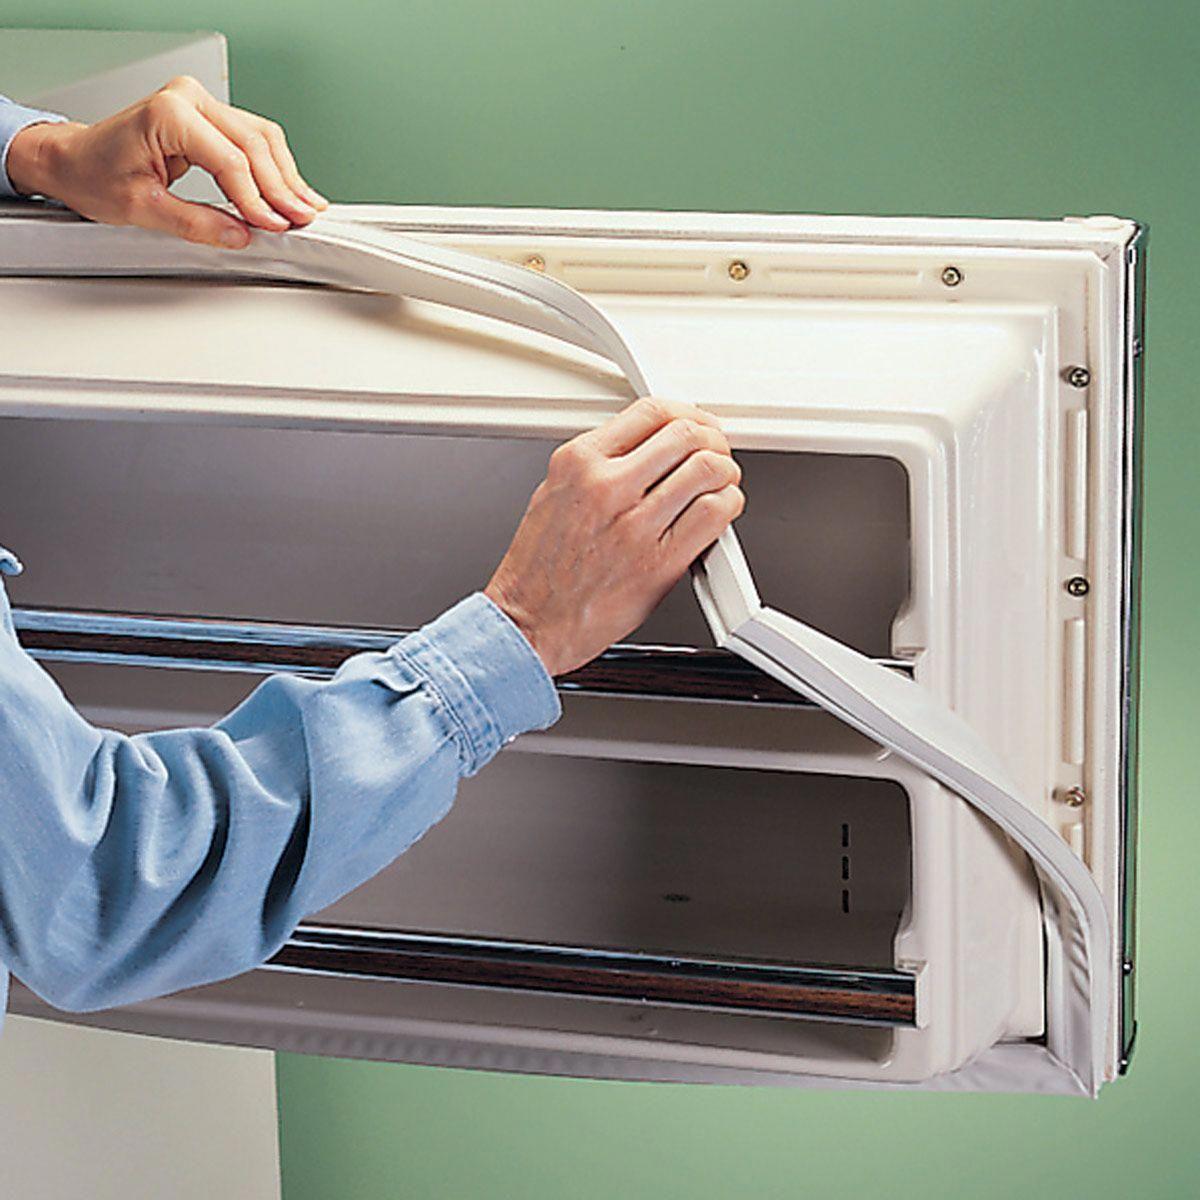 kitchenaid refrigerator ice maker leaking